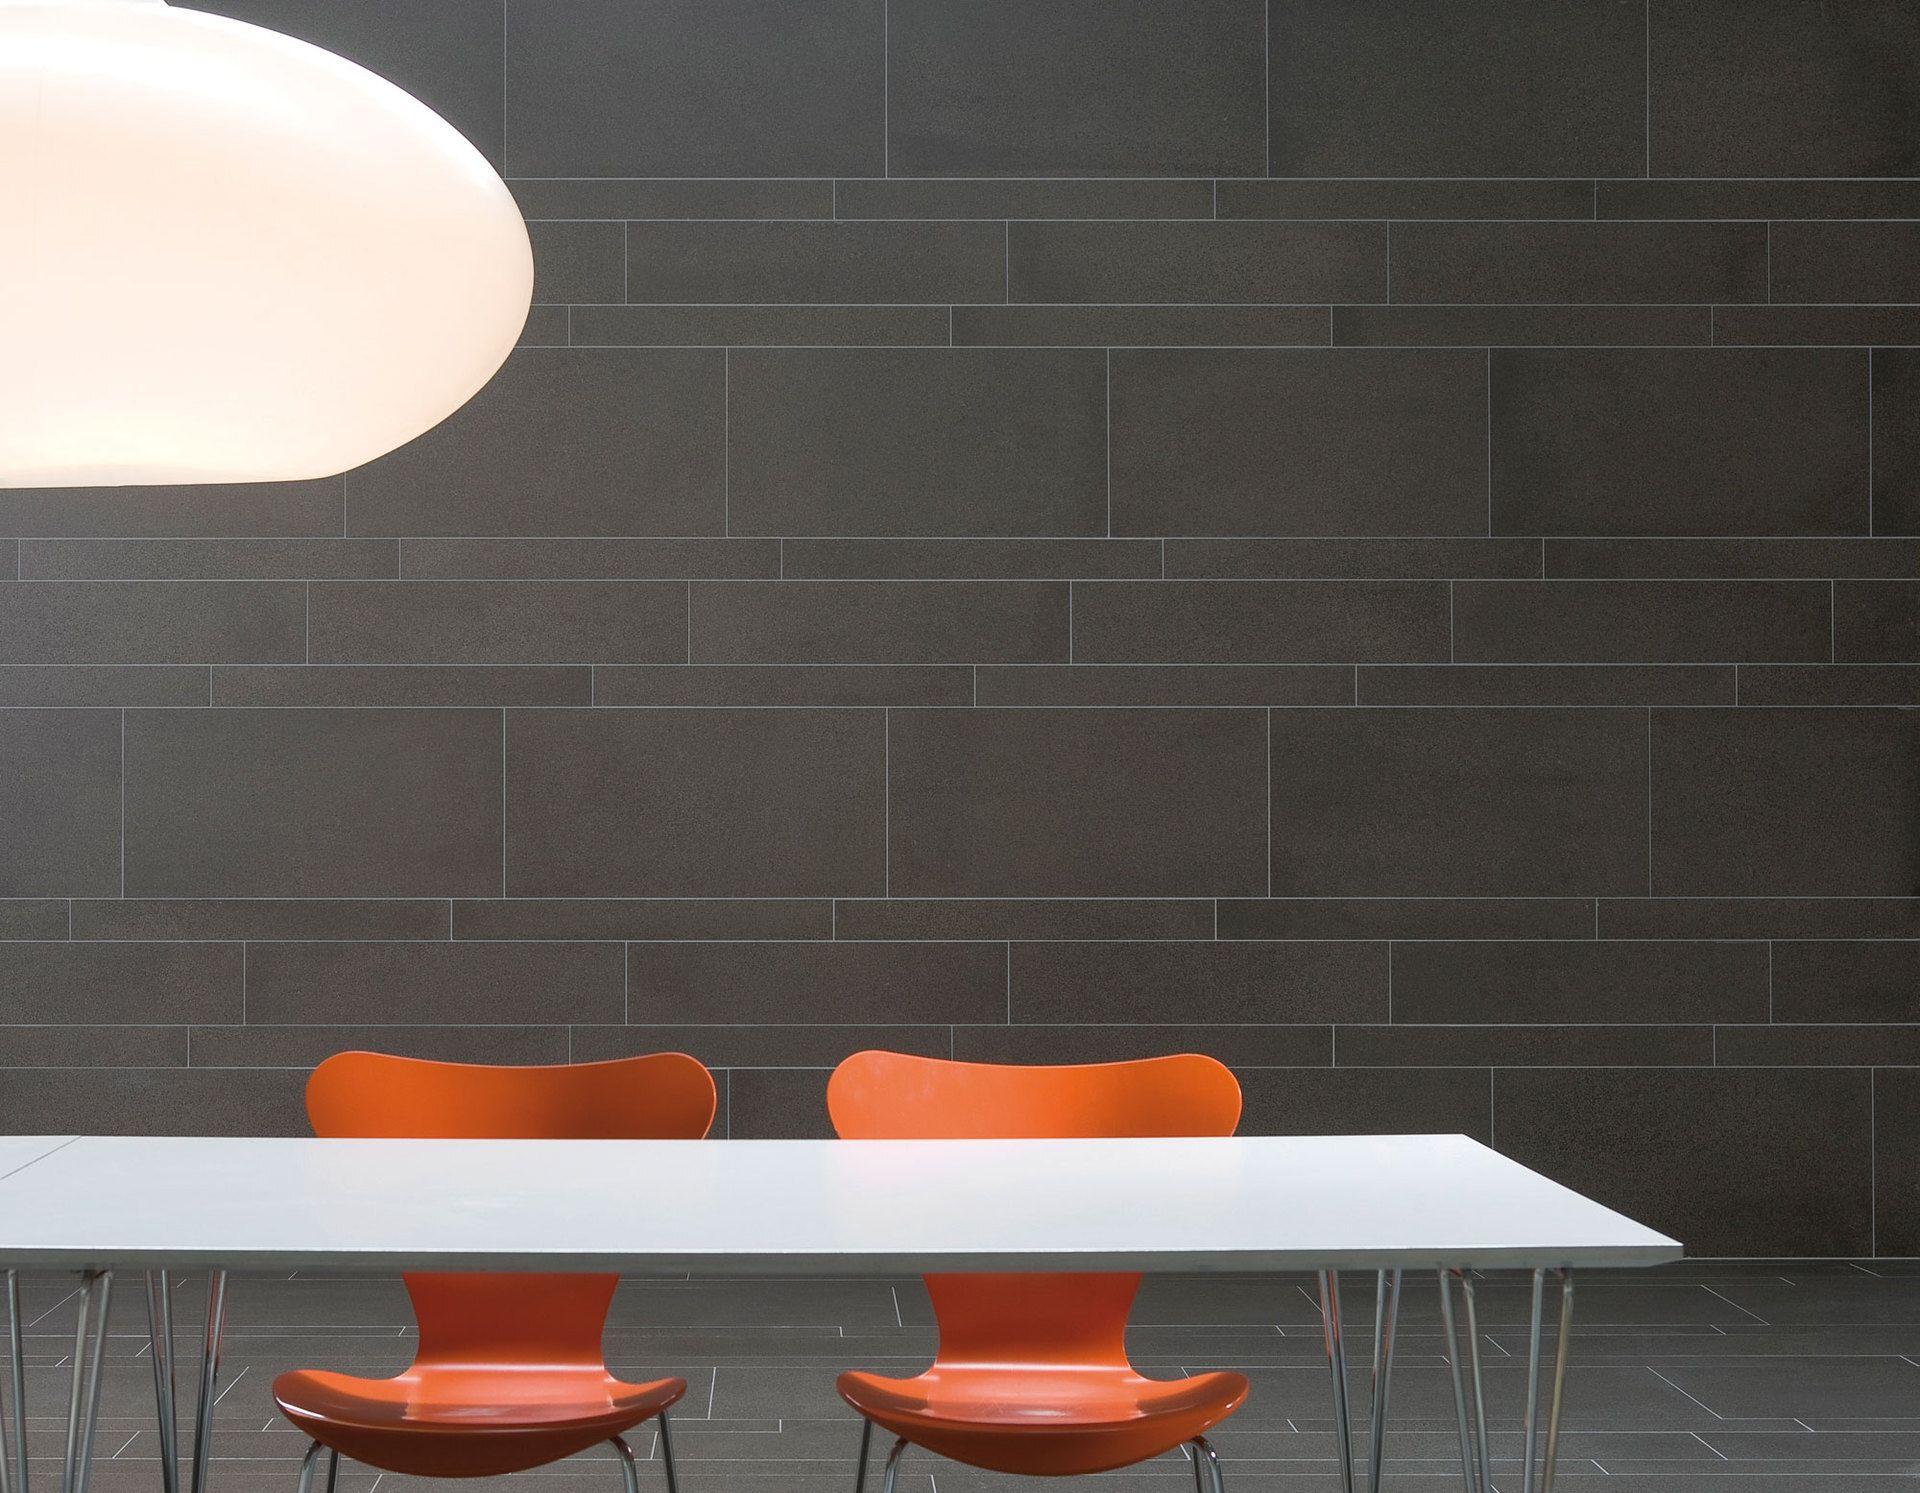 quartz fliesenserie f r wand und boden ais. Black Bedroom Furniture Sets. Home Design Ideas